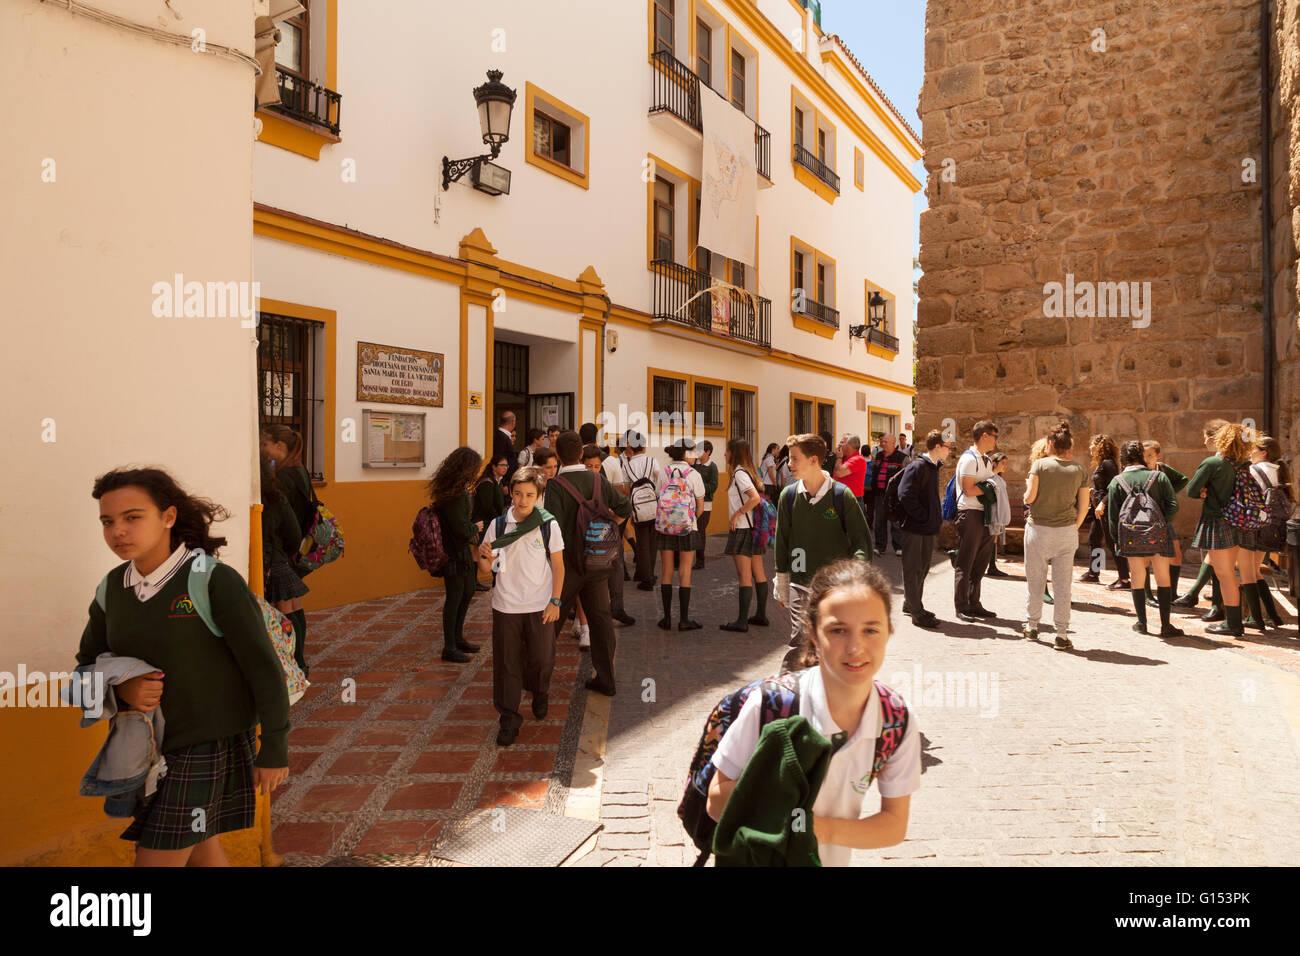 Spanish school girls in Marbella, Spain leaving school, Marbella, Andalusia, Spain Europe - Stock Image